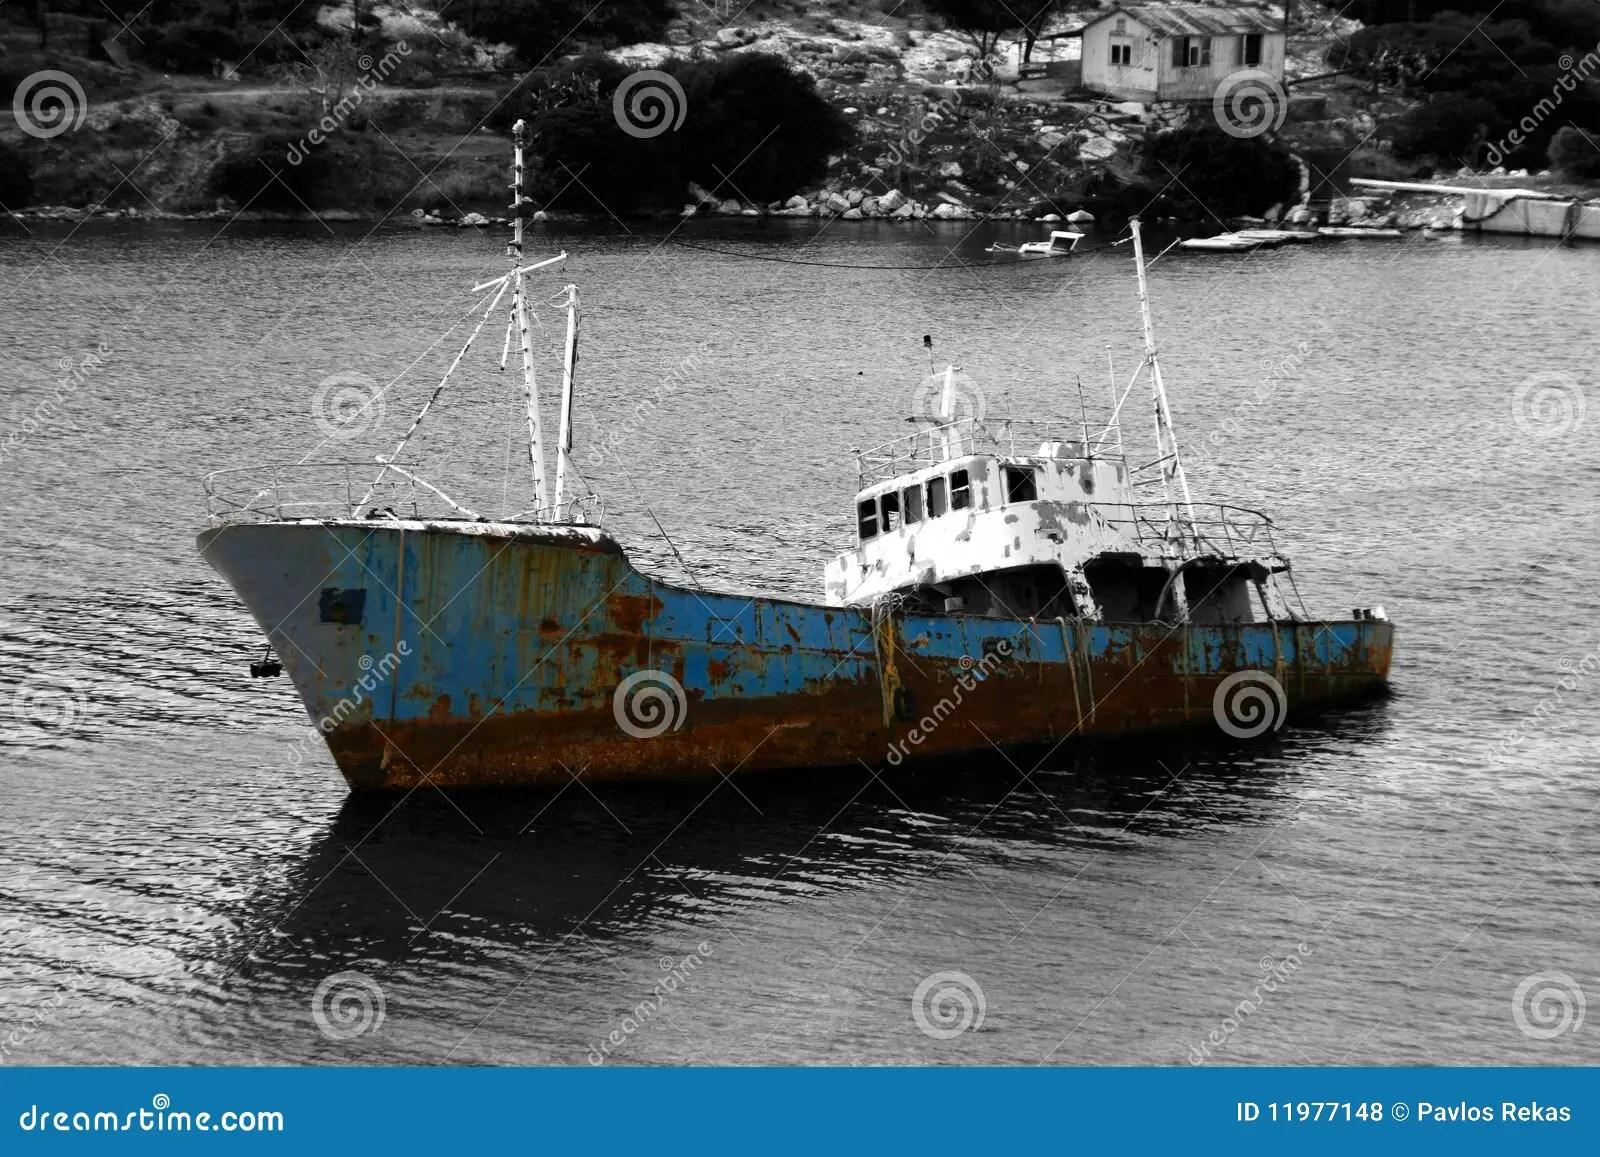 Sinking Ship Royalty Free Stock Photos